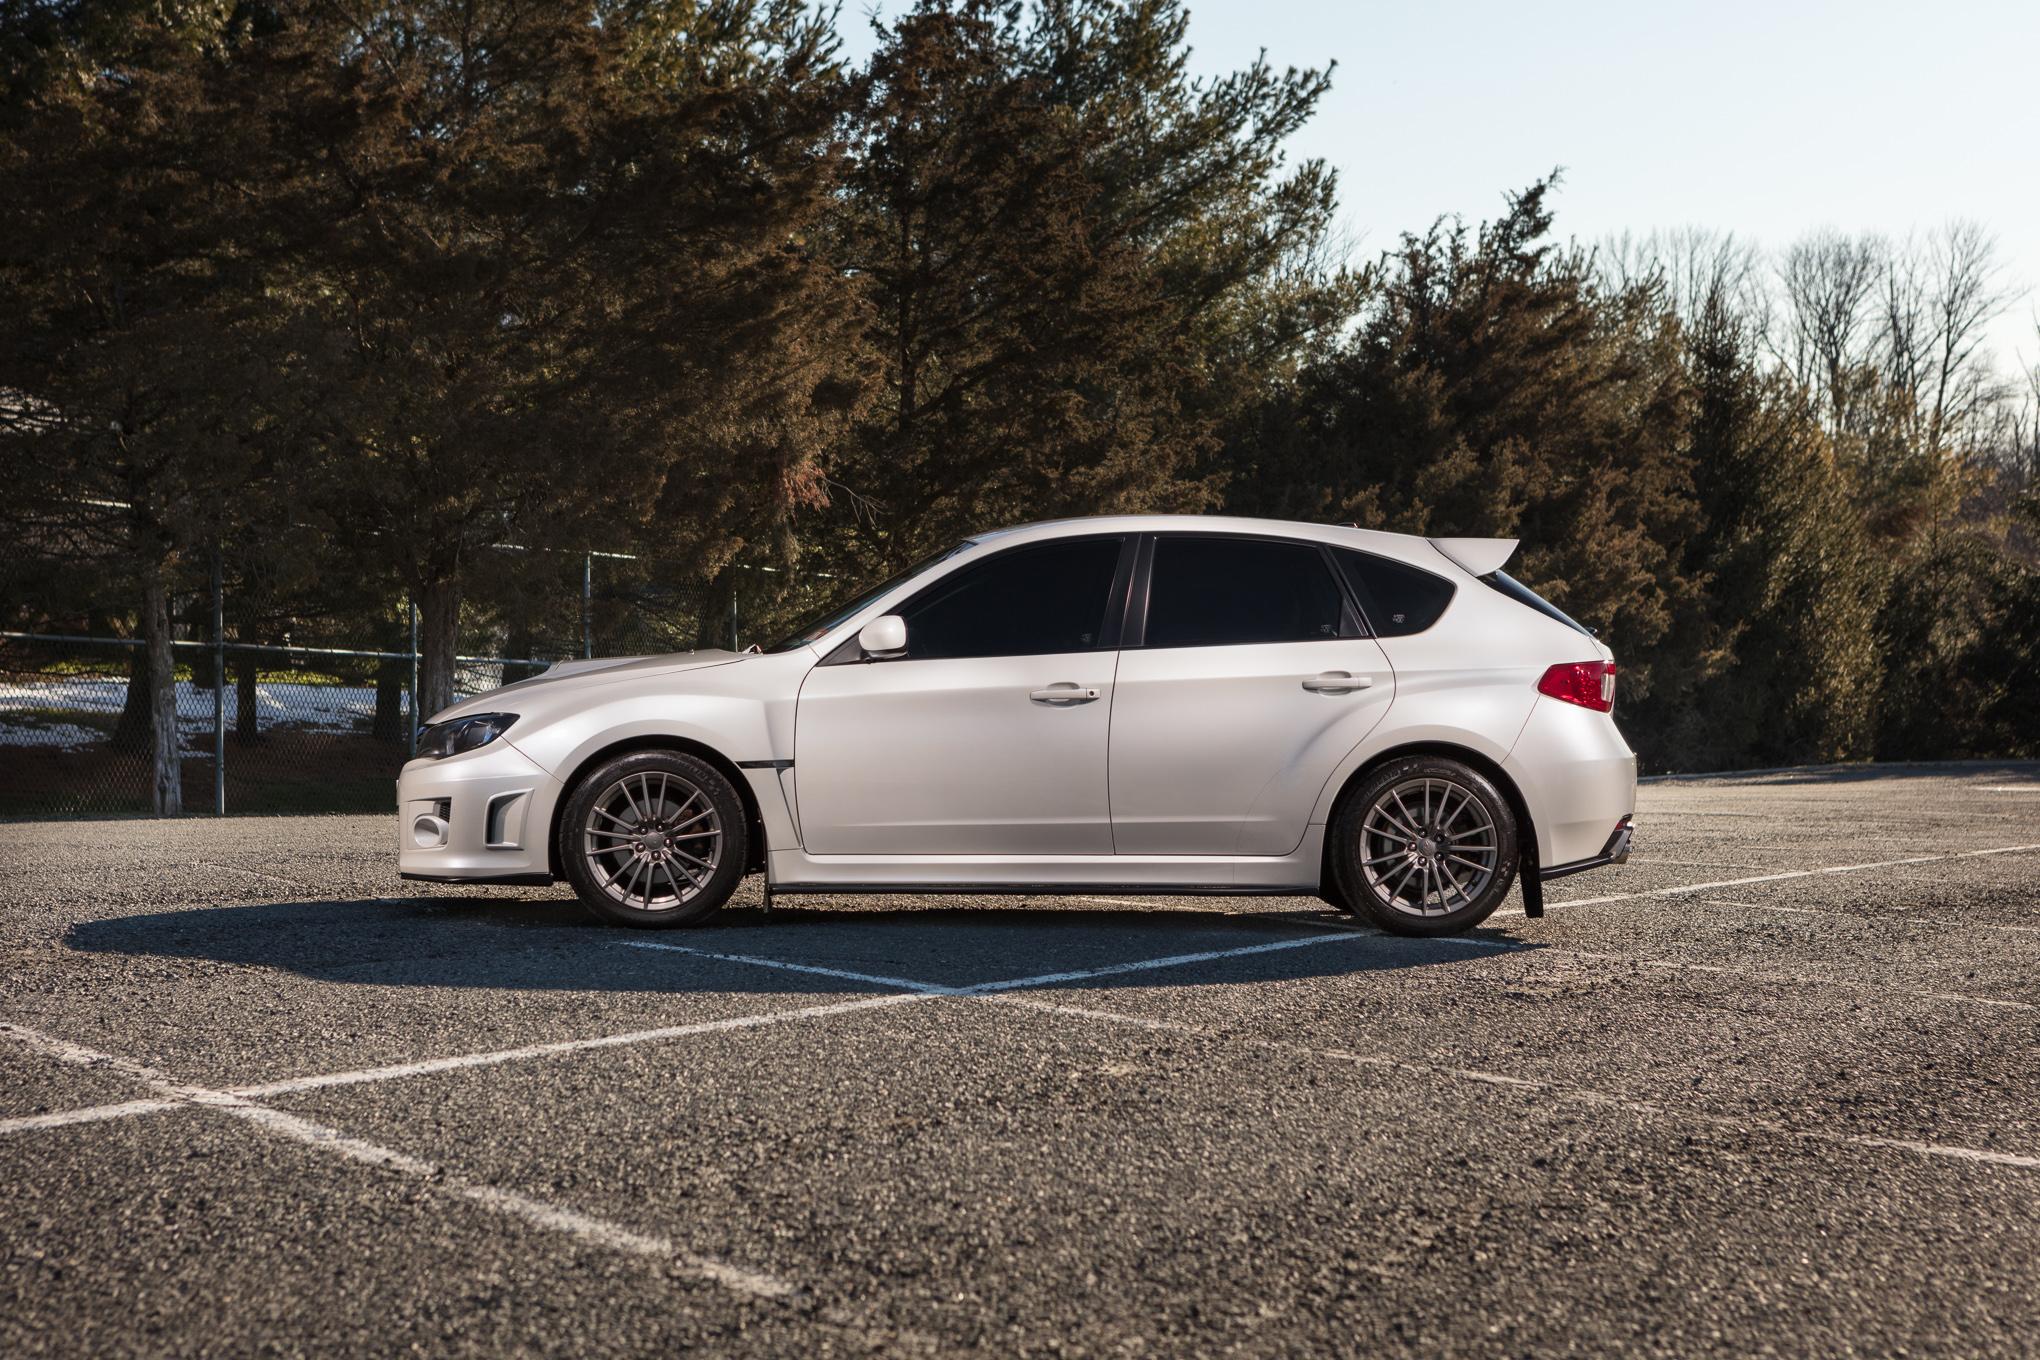 2013 Subaru WRX Hatchback, SWP-2013-subaru-wrx-0037-web-jpg